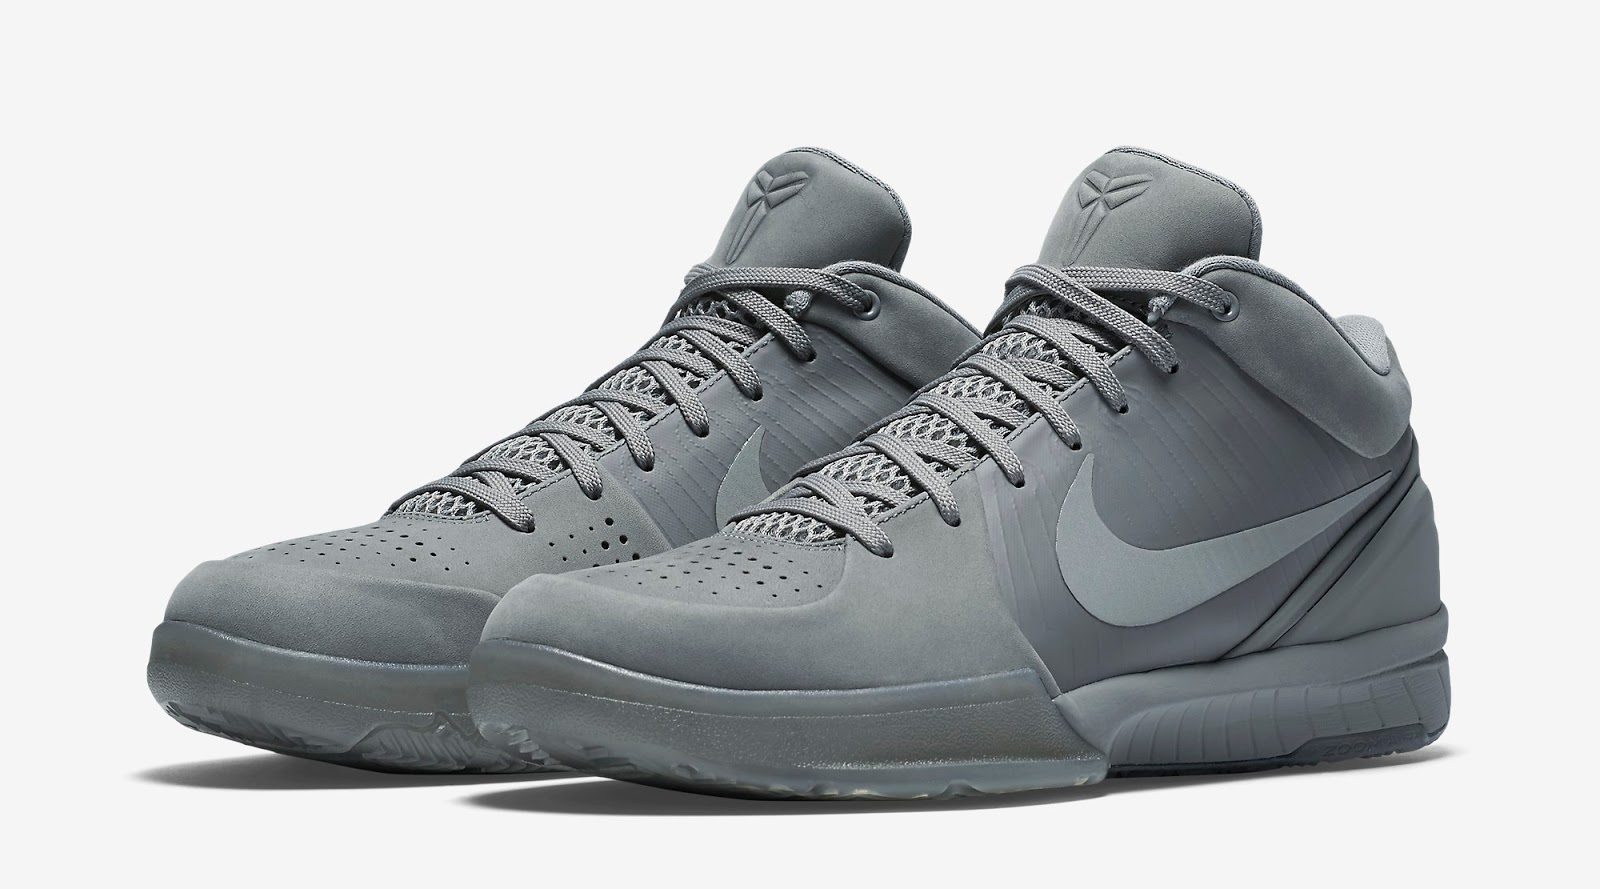 311171a8ca2b Nike Zoom Kobe IV FTB